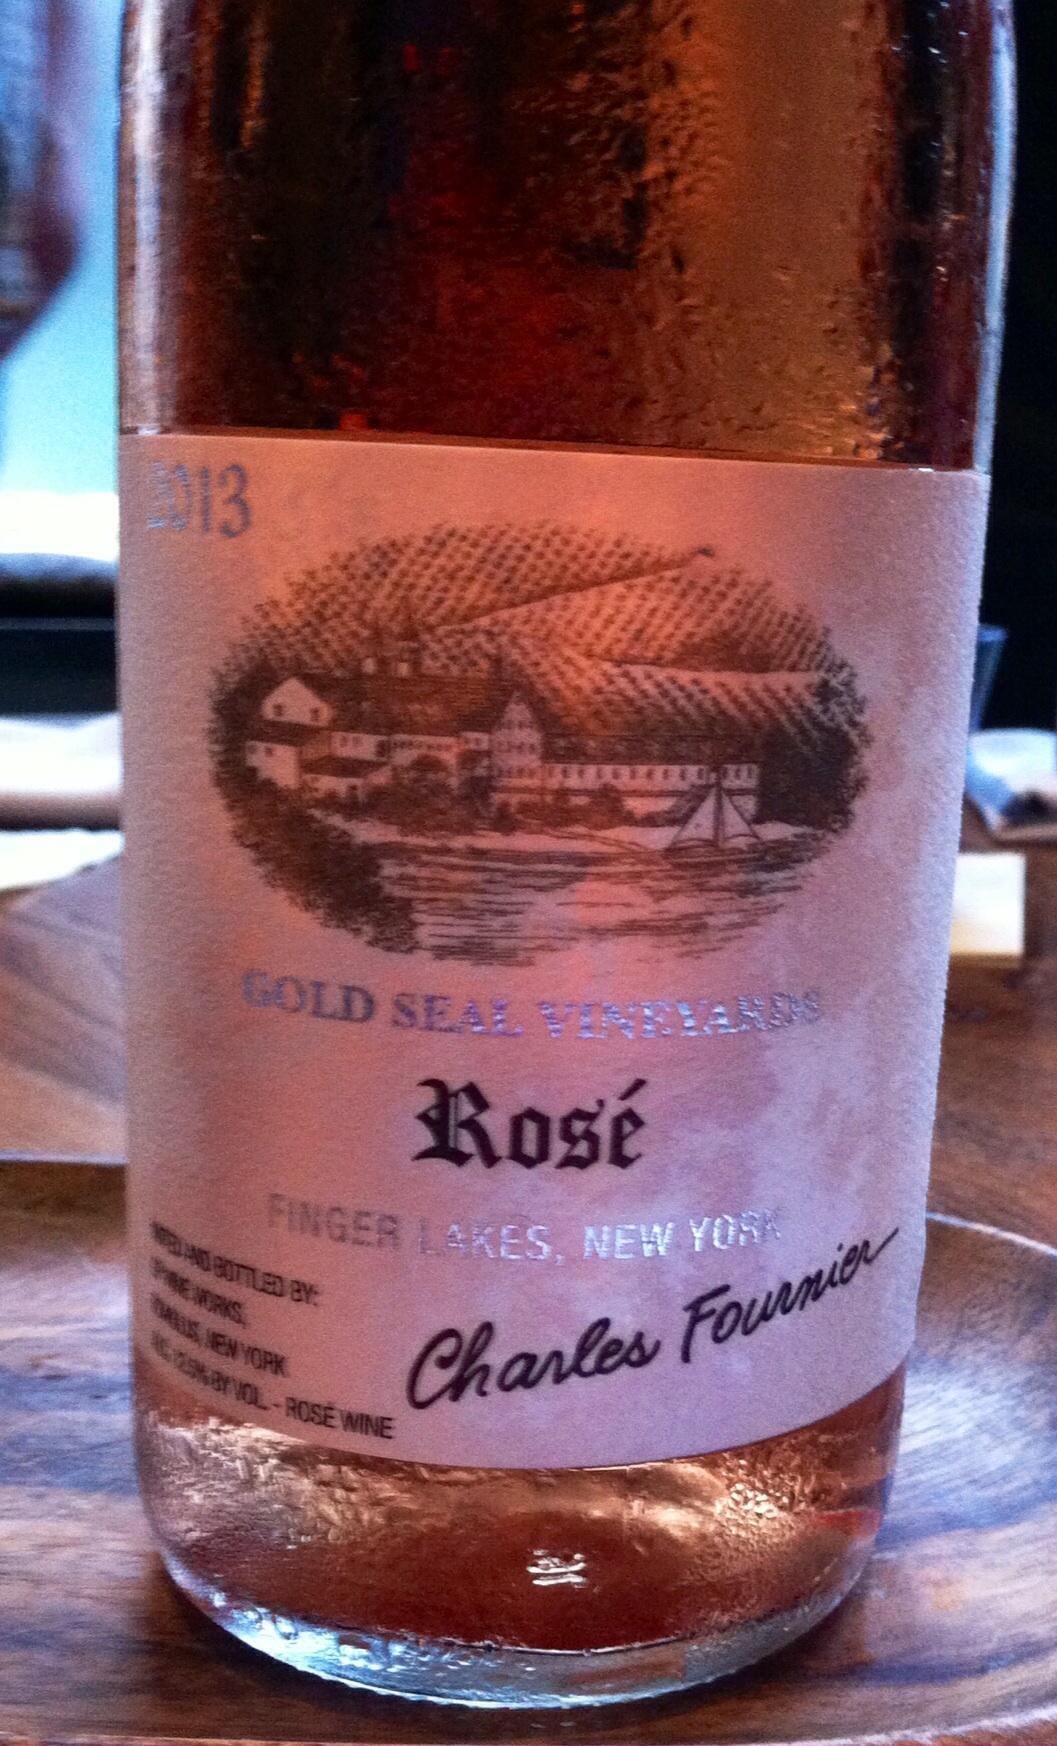 Charles Fournier, Gold Seal Vineyards, Rose, Finger Lakes, 2013. Photo by Shana Sokol, Shana Speaks Wine